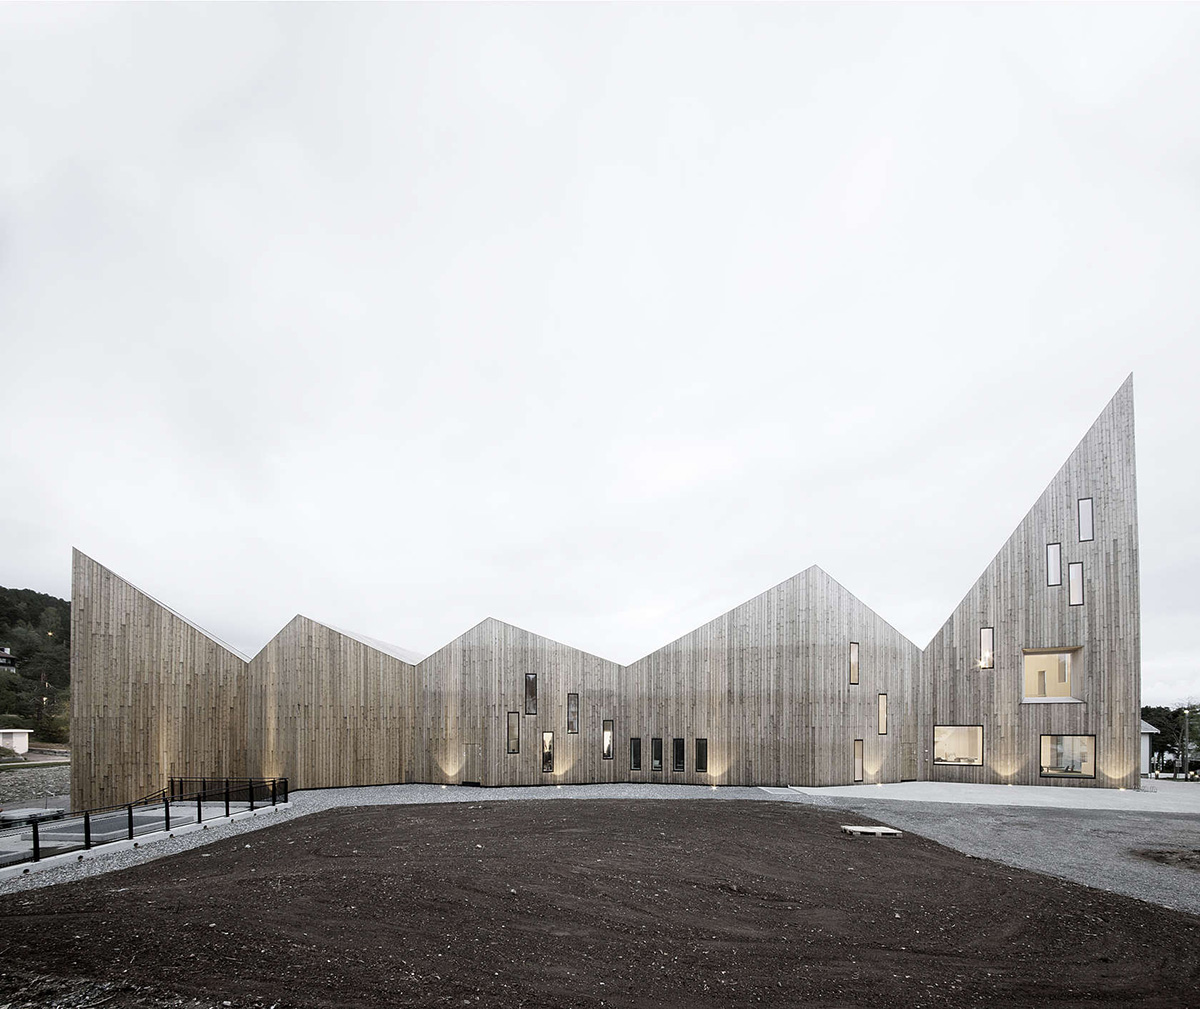 01-romsdal-folk-museum-reiulf-ramstad-architects